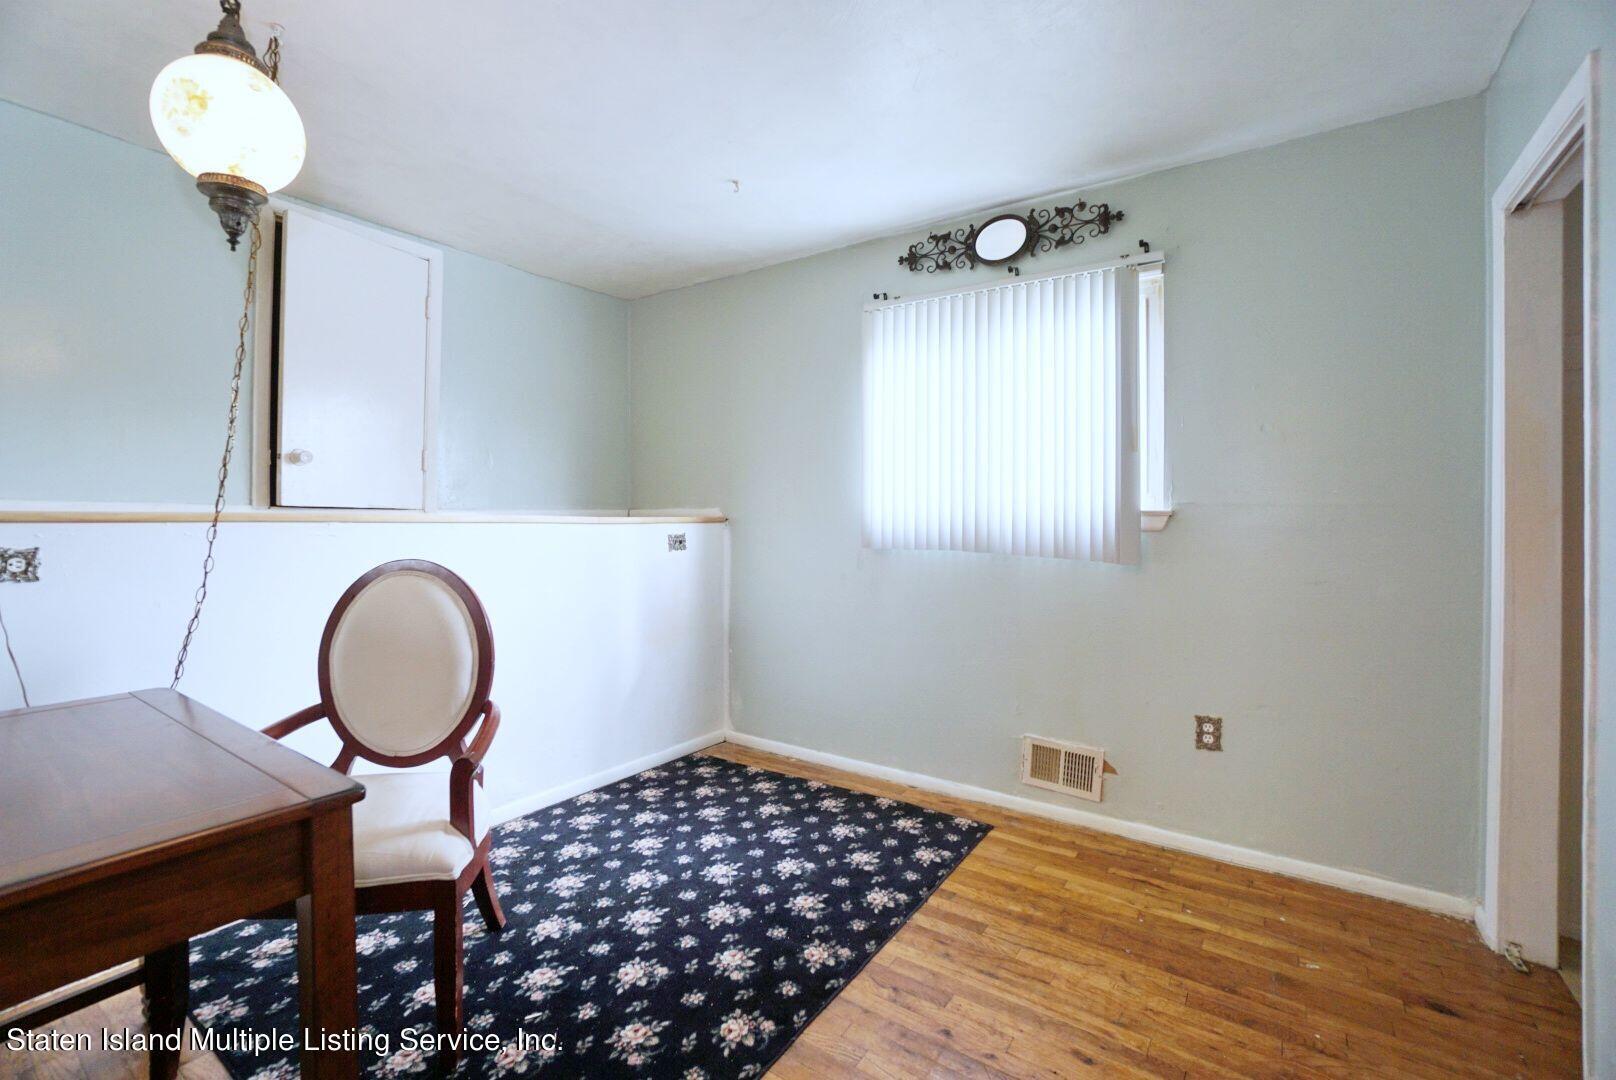 Single Family - Detached 94 Cranford Avenue  Staten Island, NY 10306, MLS-1146620-26